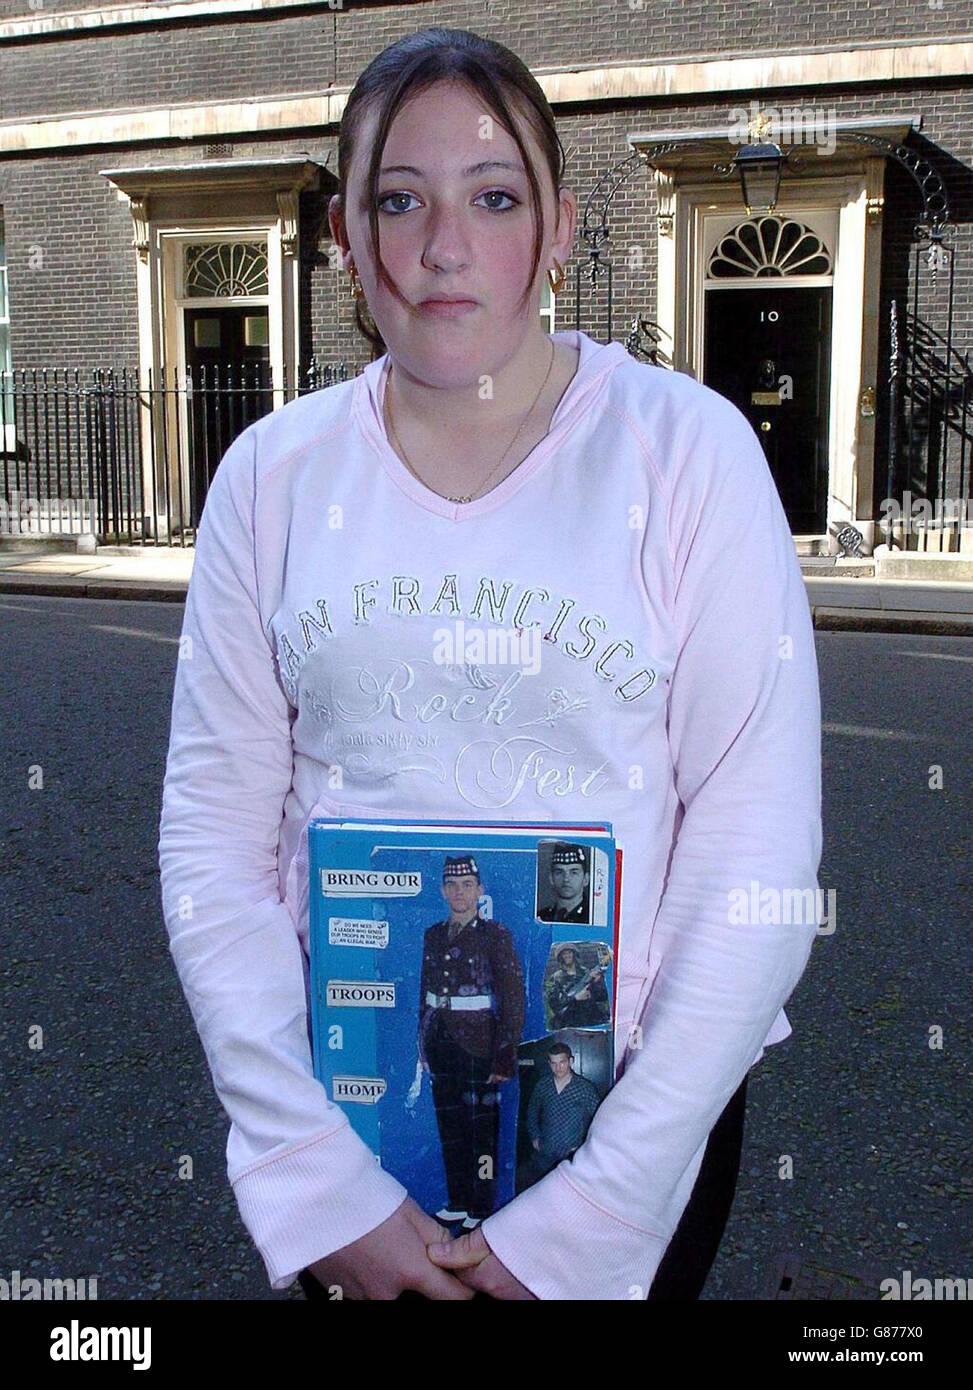 Iraq War Legal Action - 10 Downing Street Stock Photo